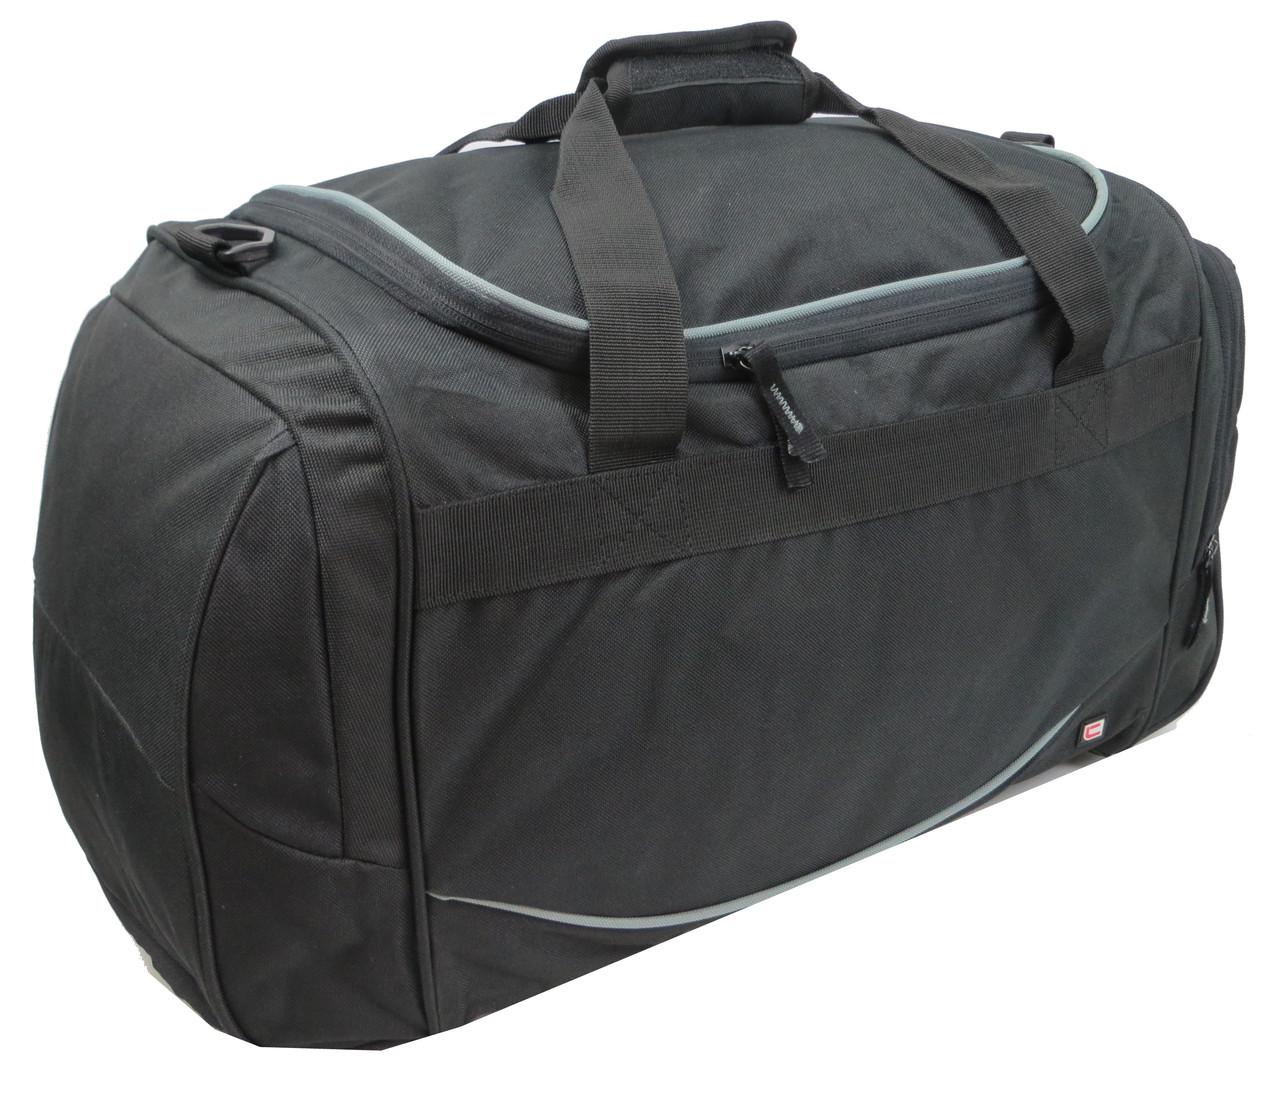 Спортивно-дорожная сумка 42L Corvet SB2001-81 черная